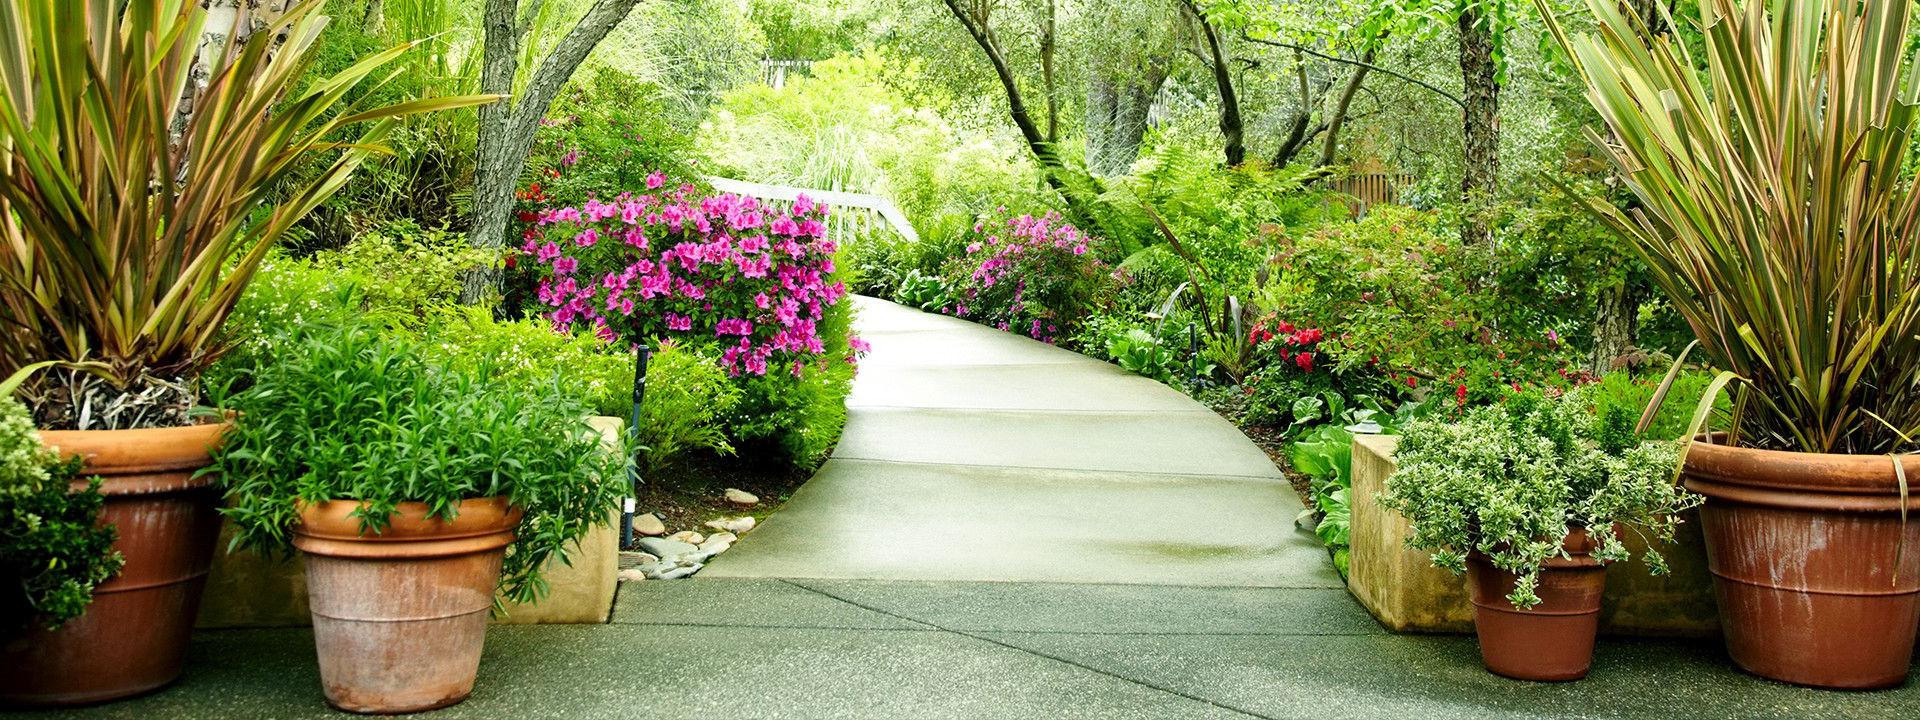 Resources | Highland Memorial Park